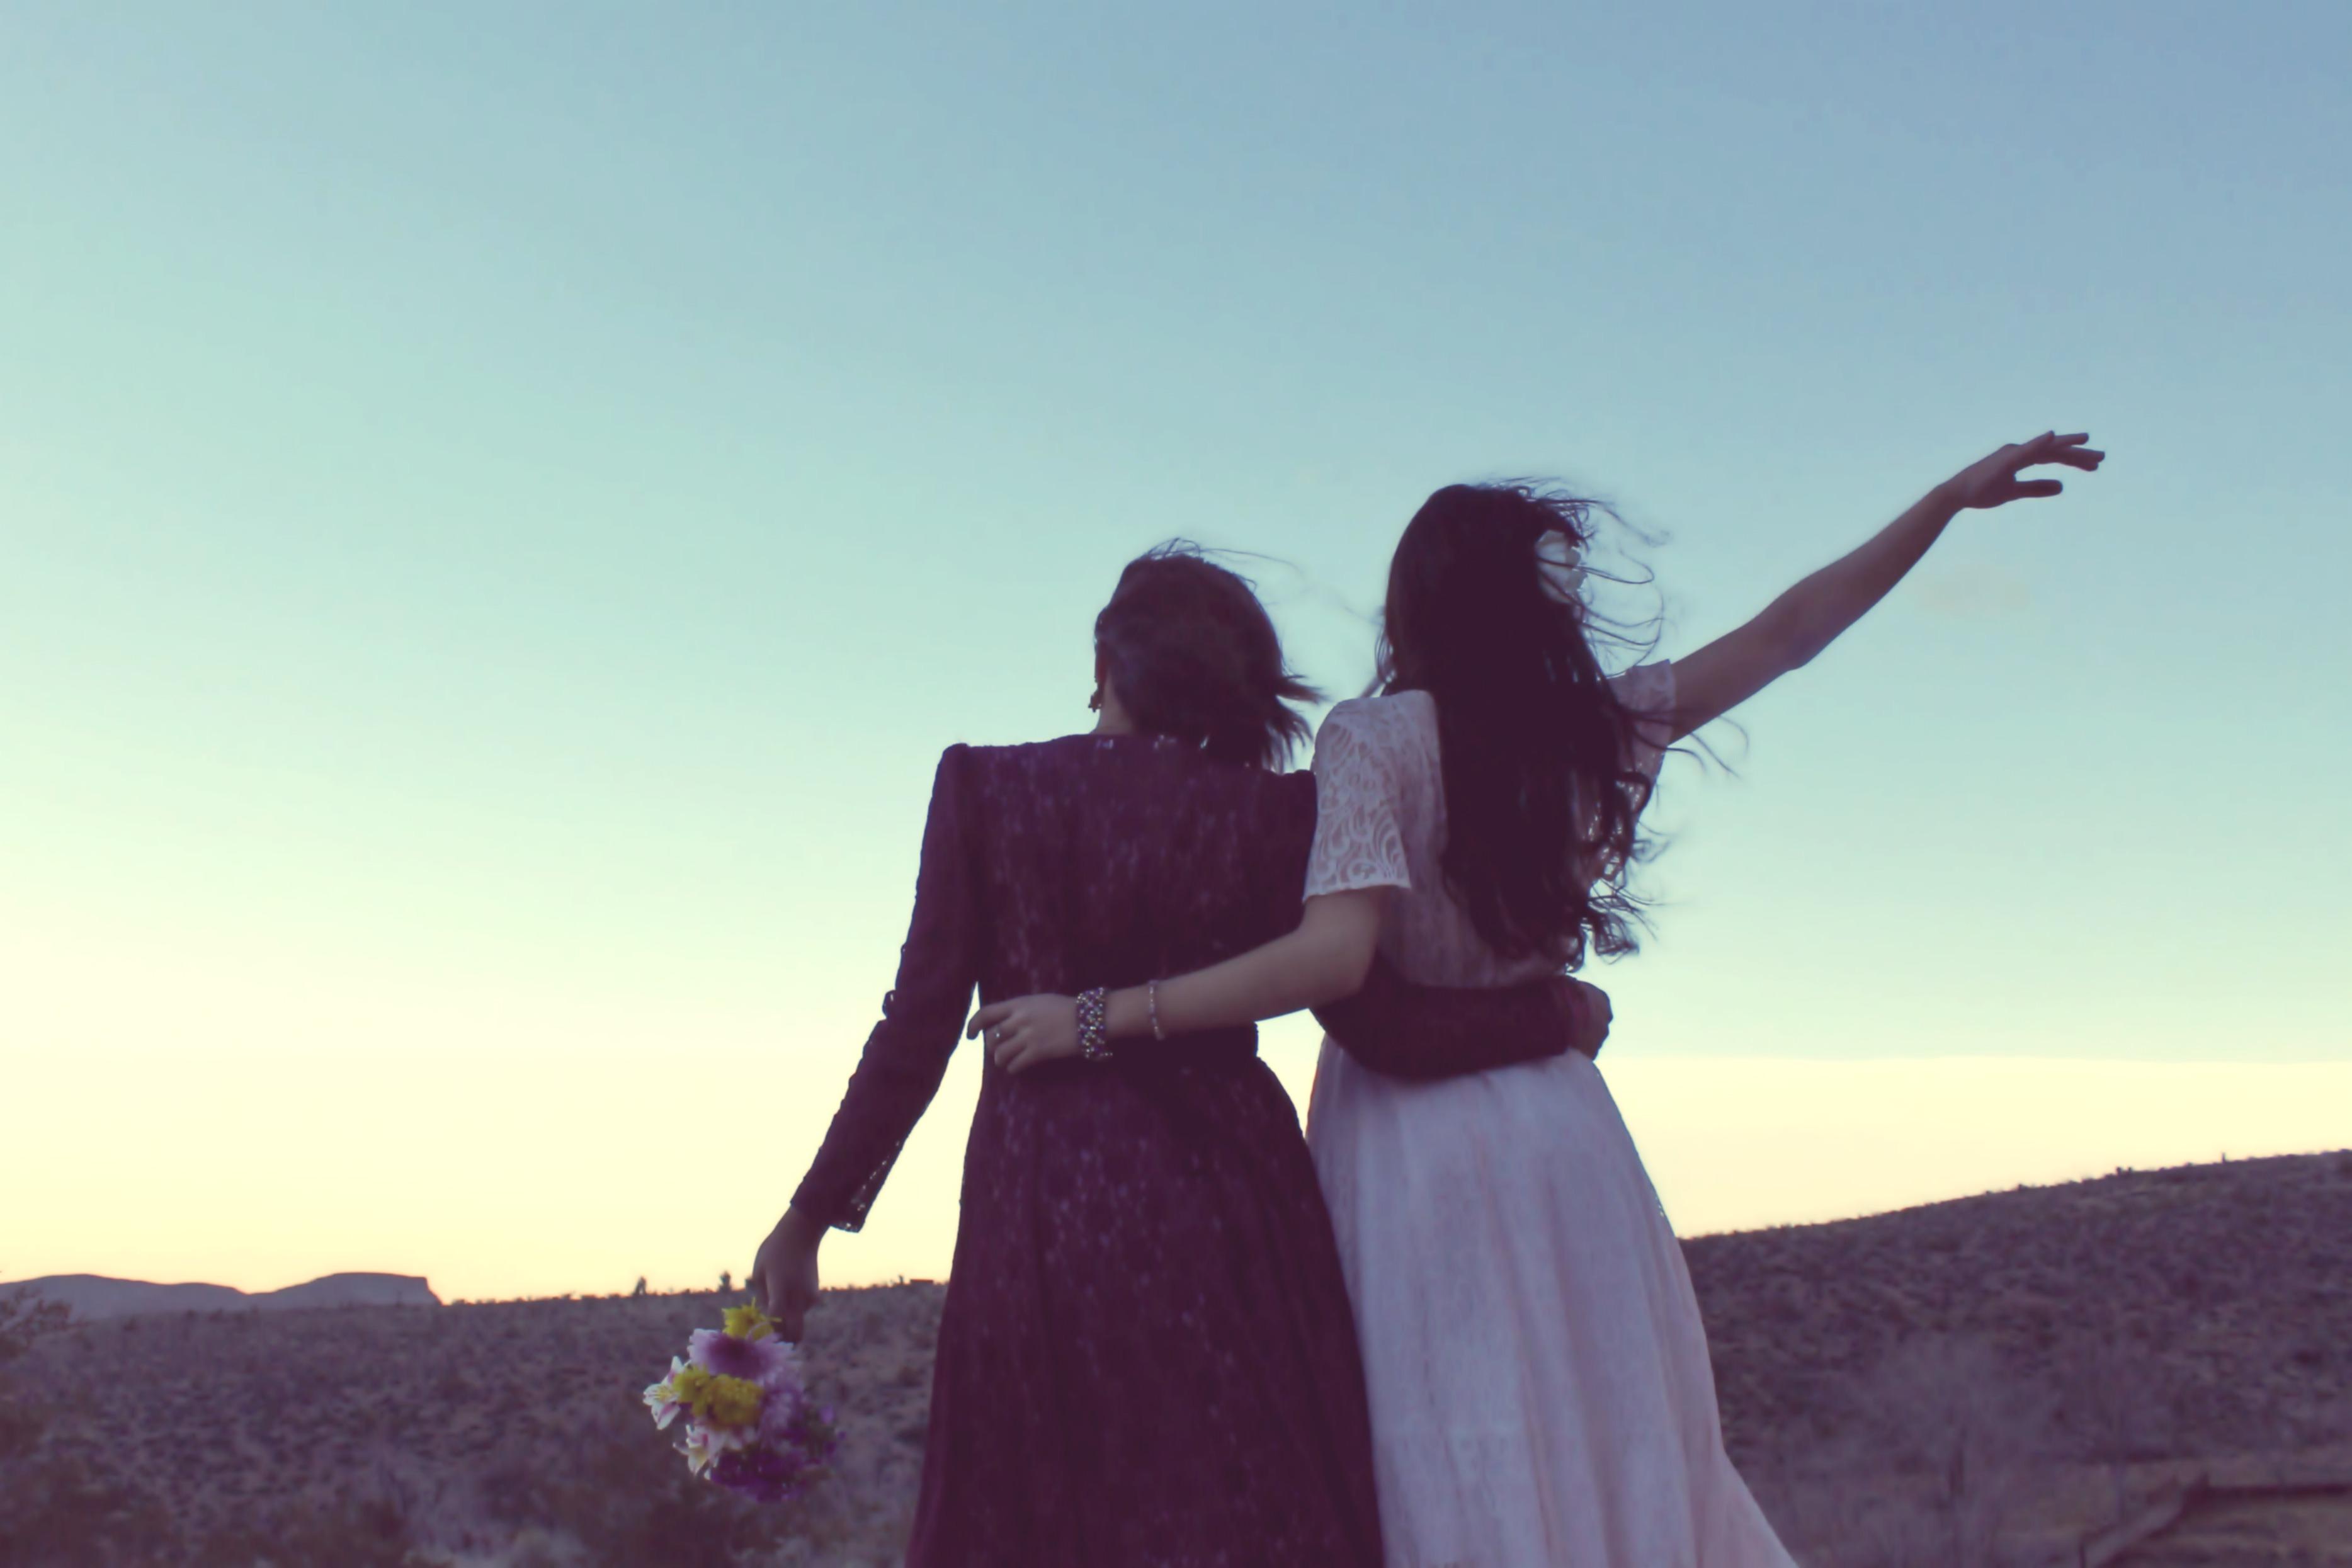 Free Images Person Woman Sunset Photography Carefree Romance Huging Sponge Friendship Bride Hug Desert Landscape Dress Photograph Image Goodbye Hugging